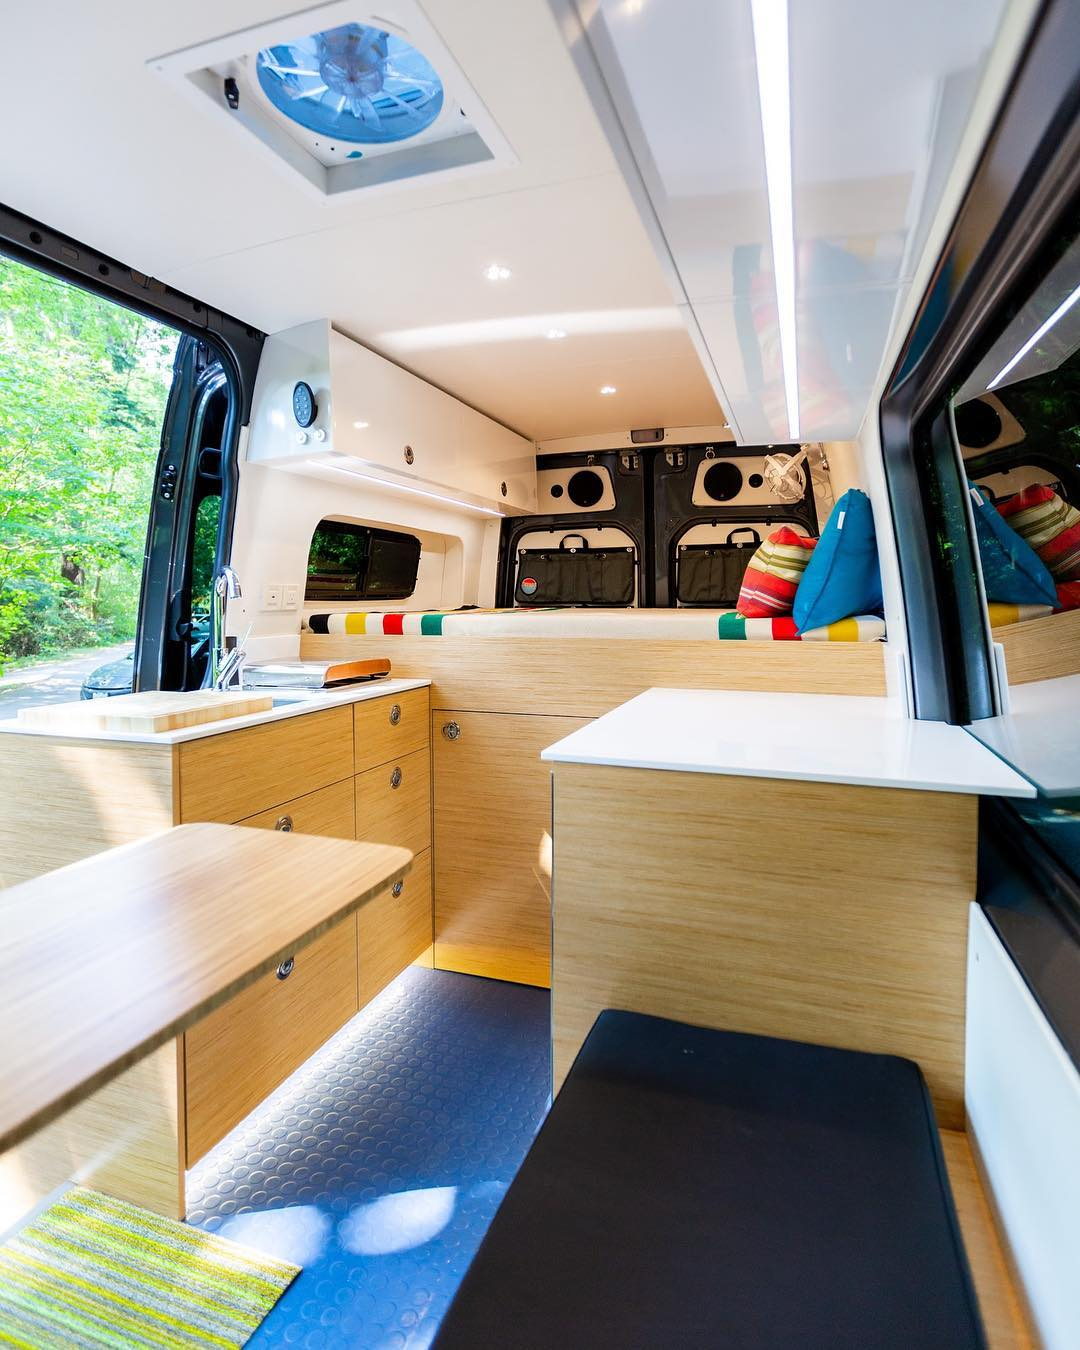 1606270058 114 Ideas de conversion de camioneta Sprinter de bricolaje